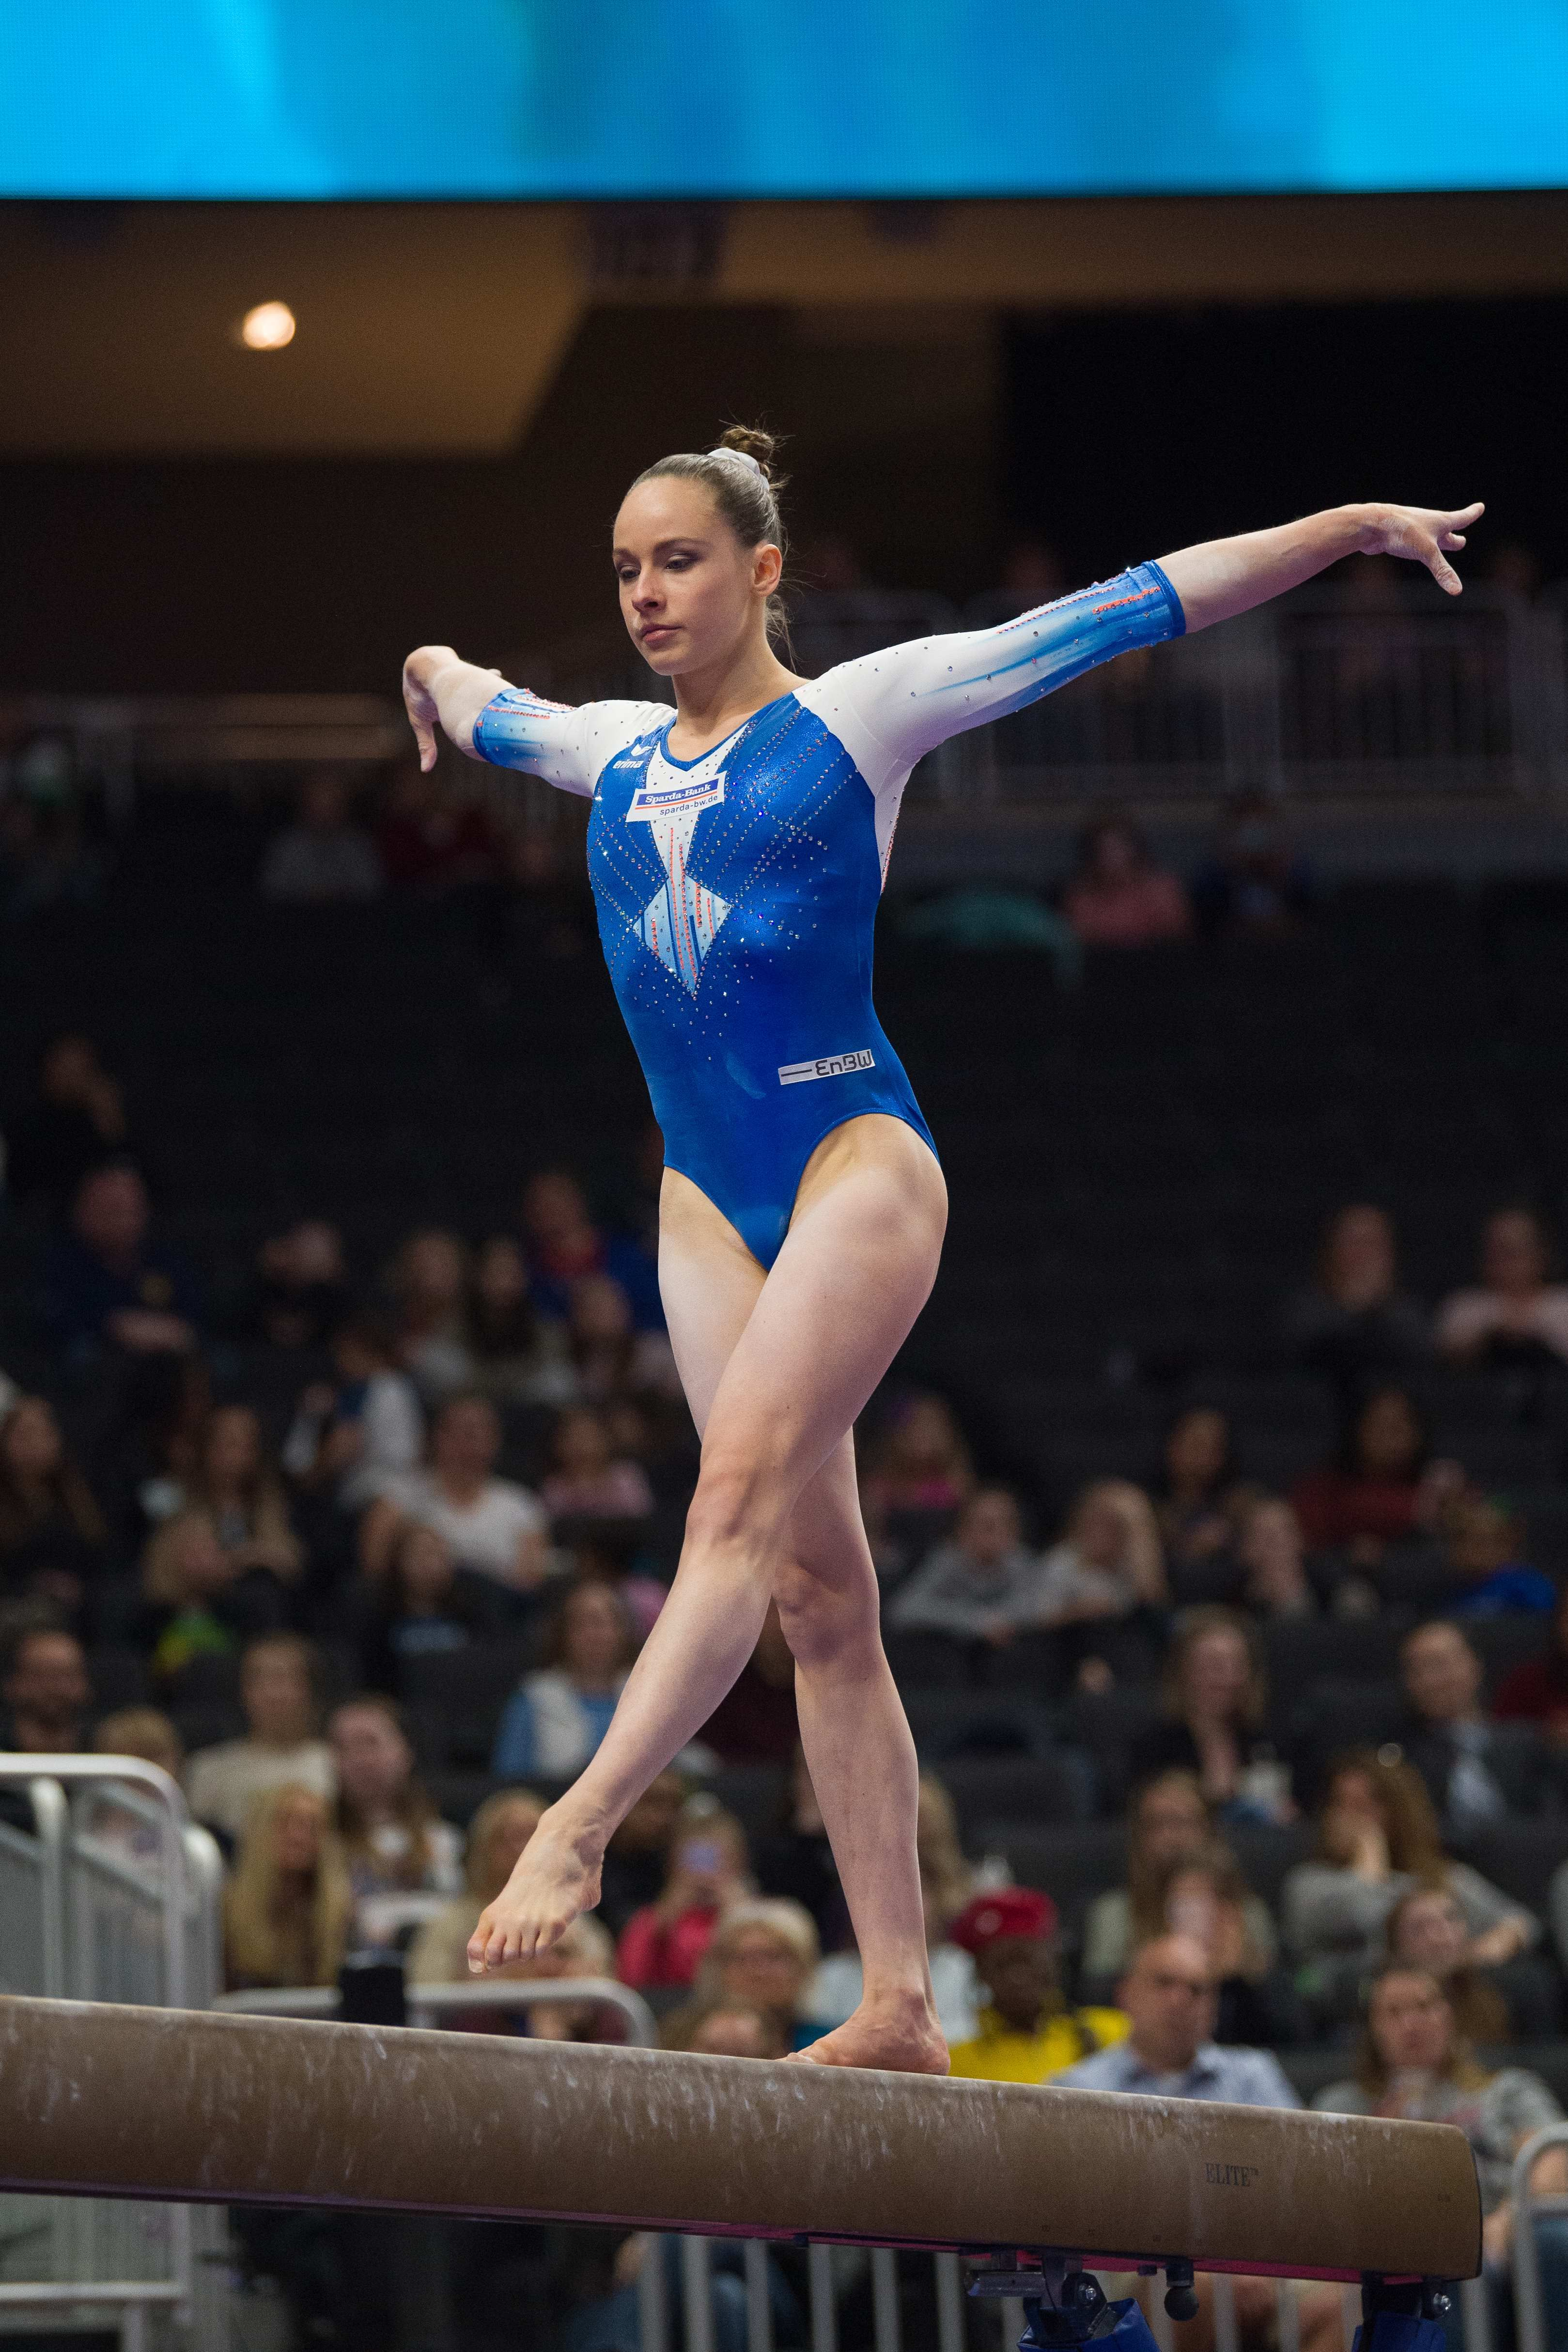 Sarah Voss In 2020 Gymnastics Photos Gymnastics Artistic Gymnastics